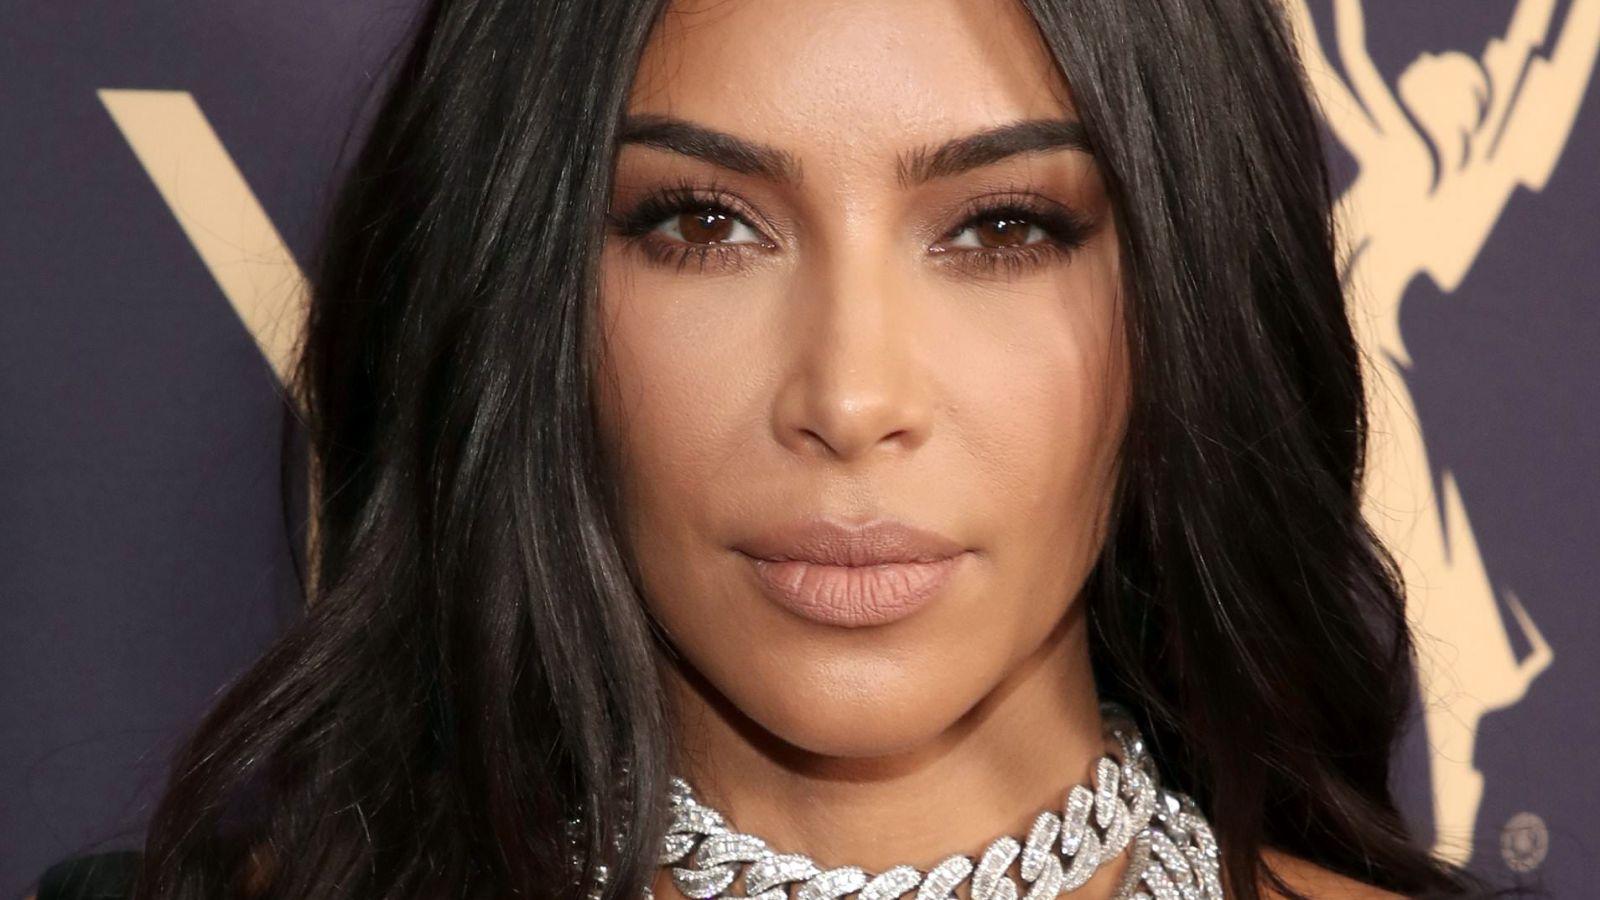 Kim Kardashian: Μας κάνει ένα μίνι σεμινάριο μακιγιάζ [vid]